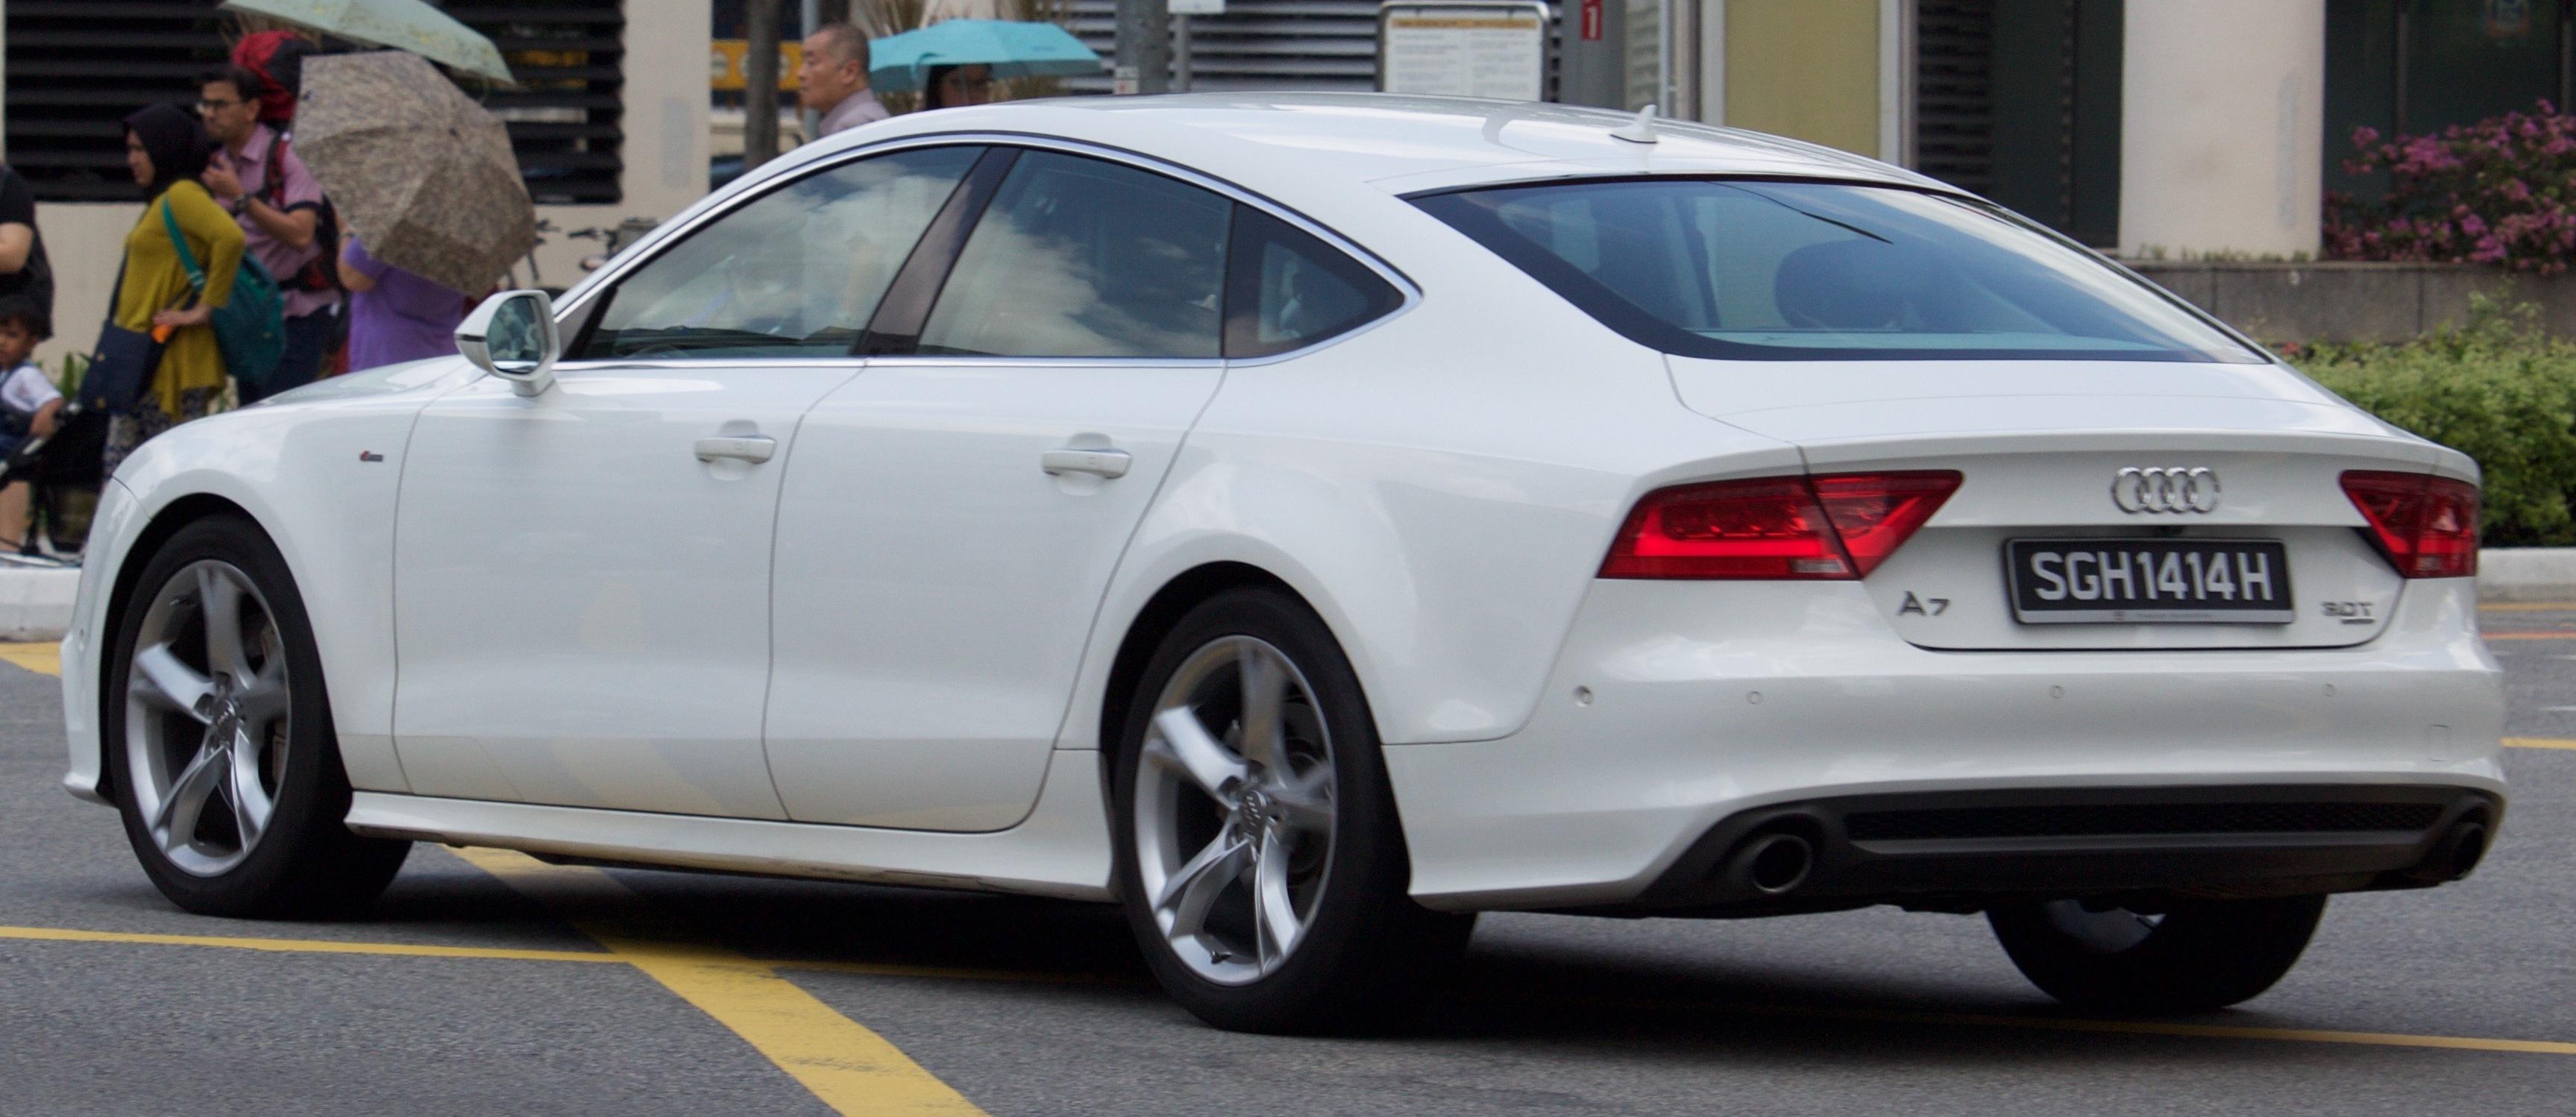 Kelebihan Kekurangan Audi A7 2011 Murah Berkualitas